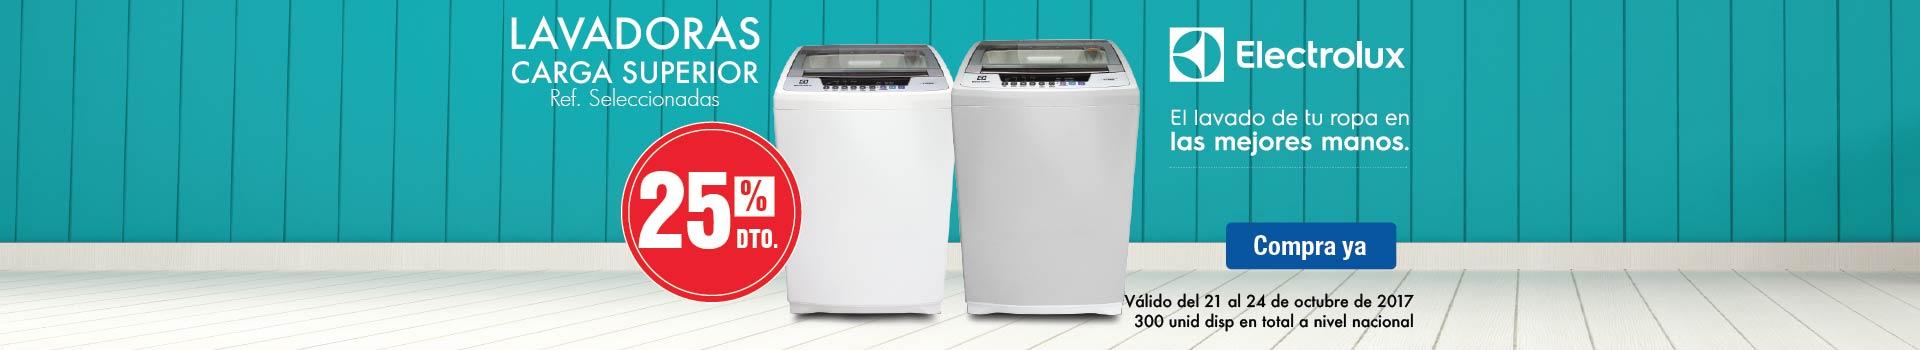 CAT ELECT AKyKT-1-LB-25dto-lavadorasELECTROLUX-ref-selec-carga-superior-cat-oct21-24